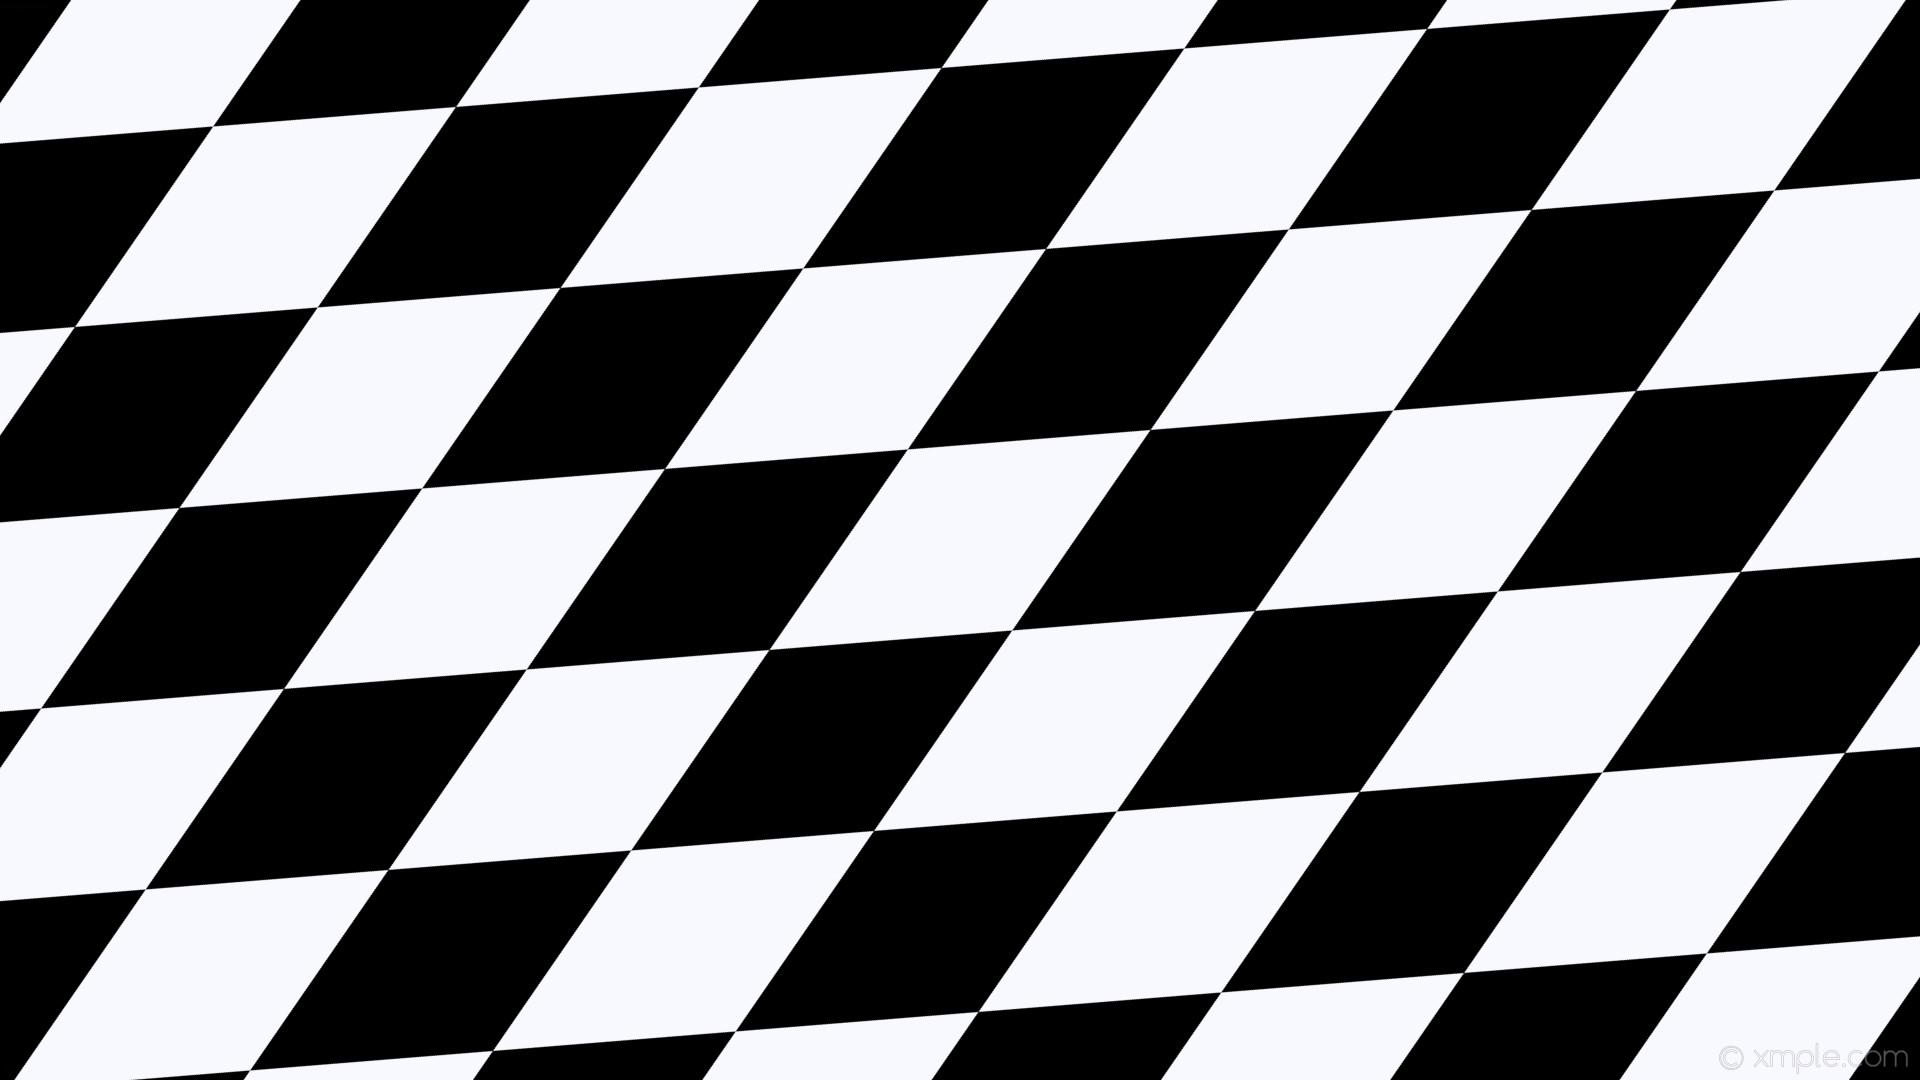 1920x1080 Wallpaper Rhombus Diamond Black Lozenge White Ghost F8f8ff 000000 30A 440px